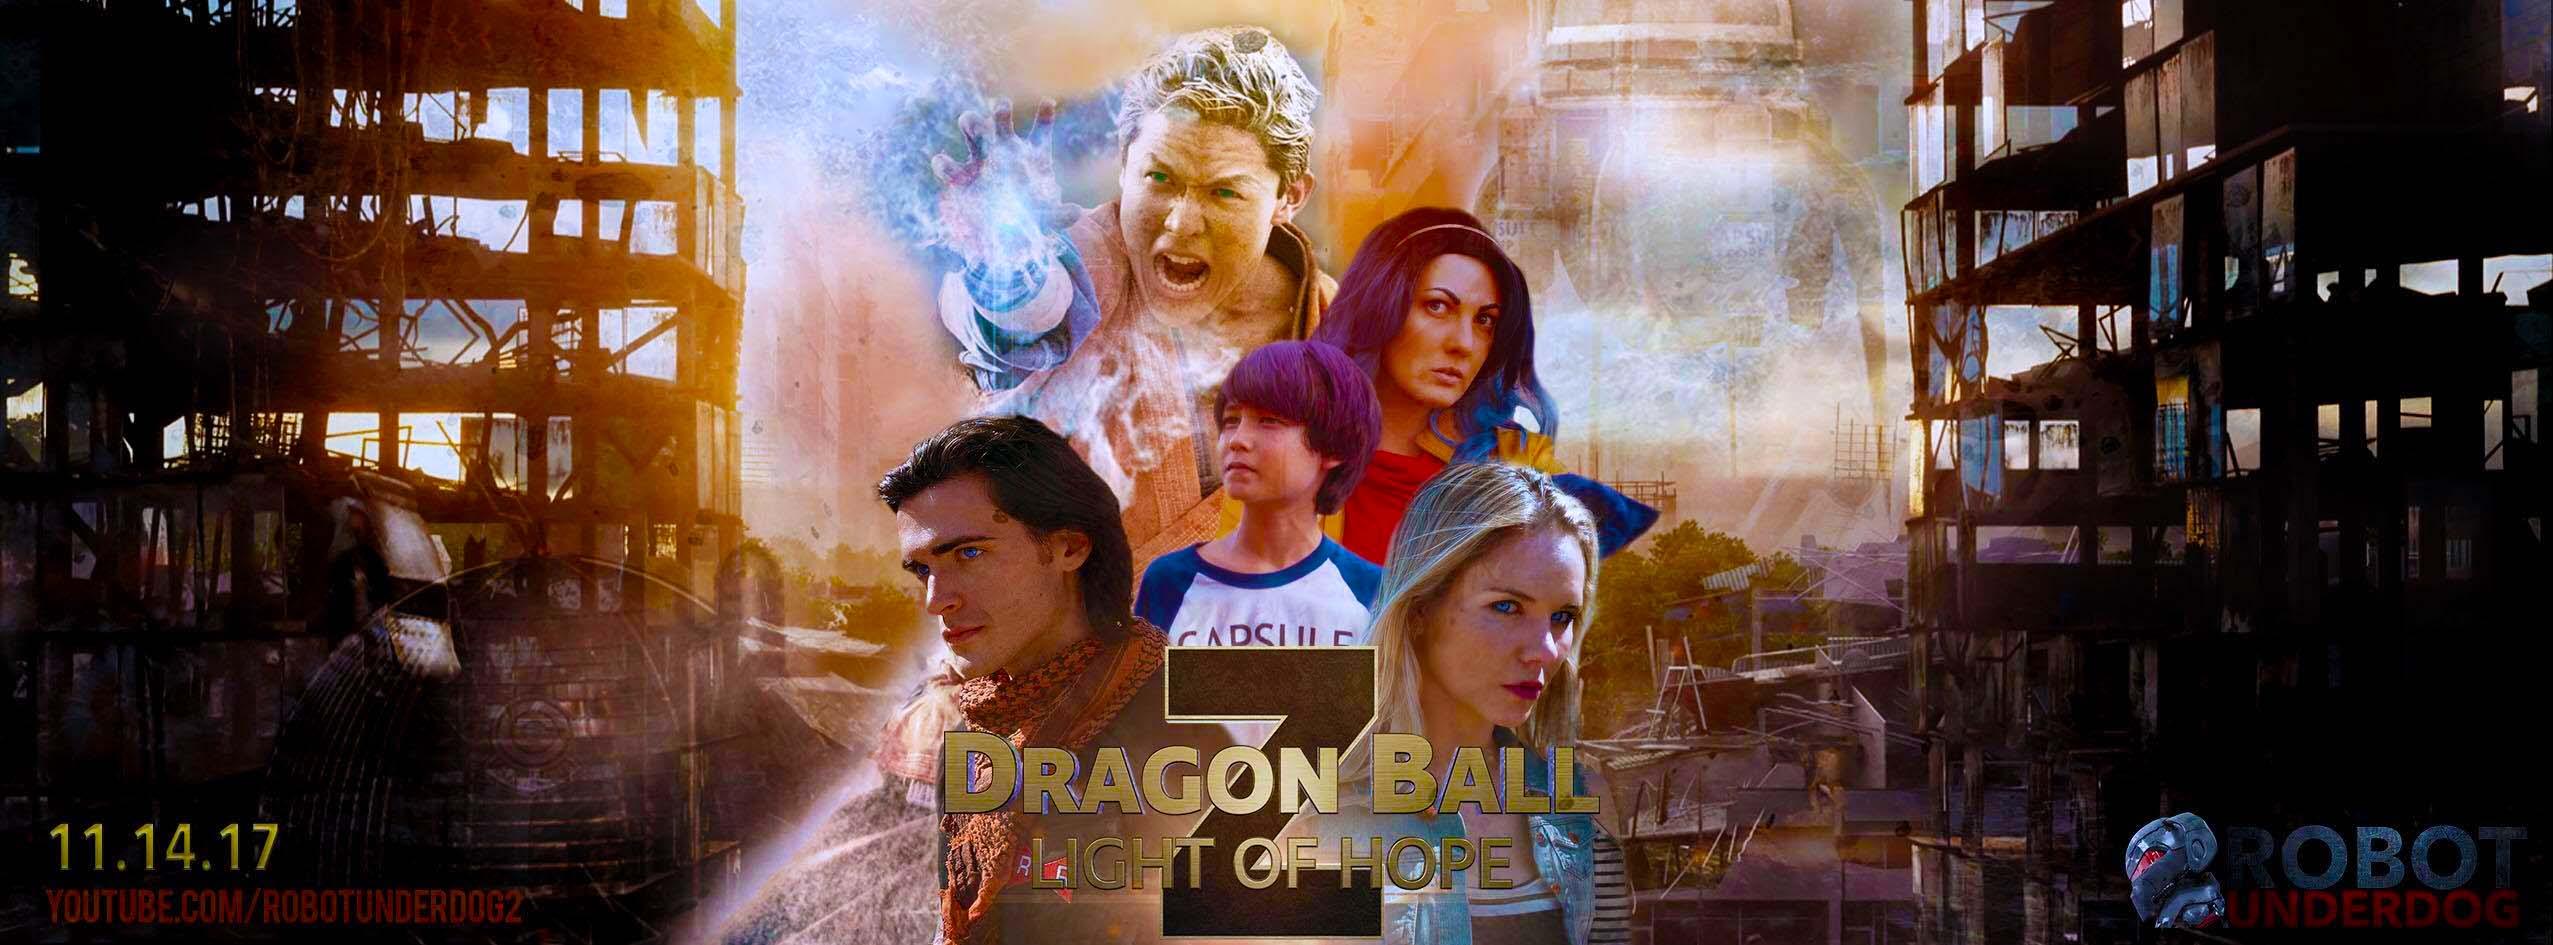 Dragon Ball Z: Light Of Hope Film Premieres In November